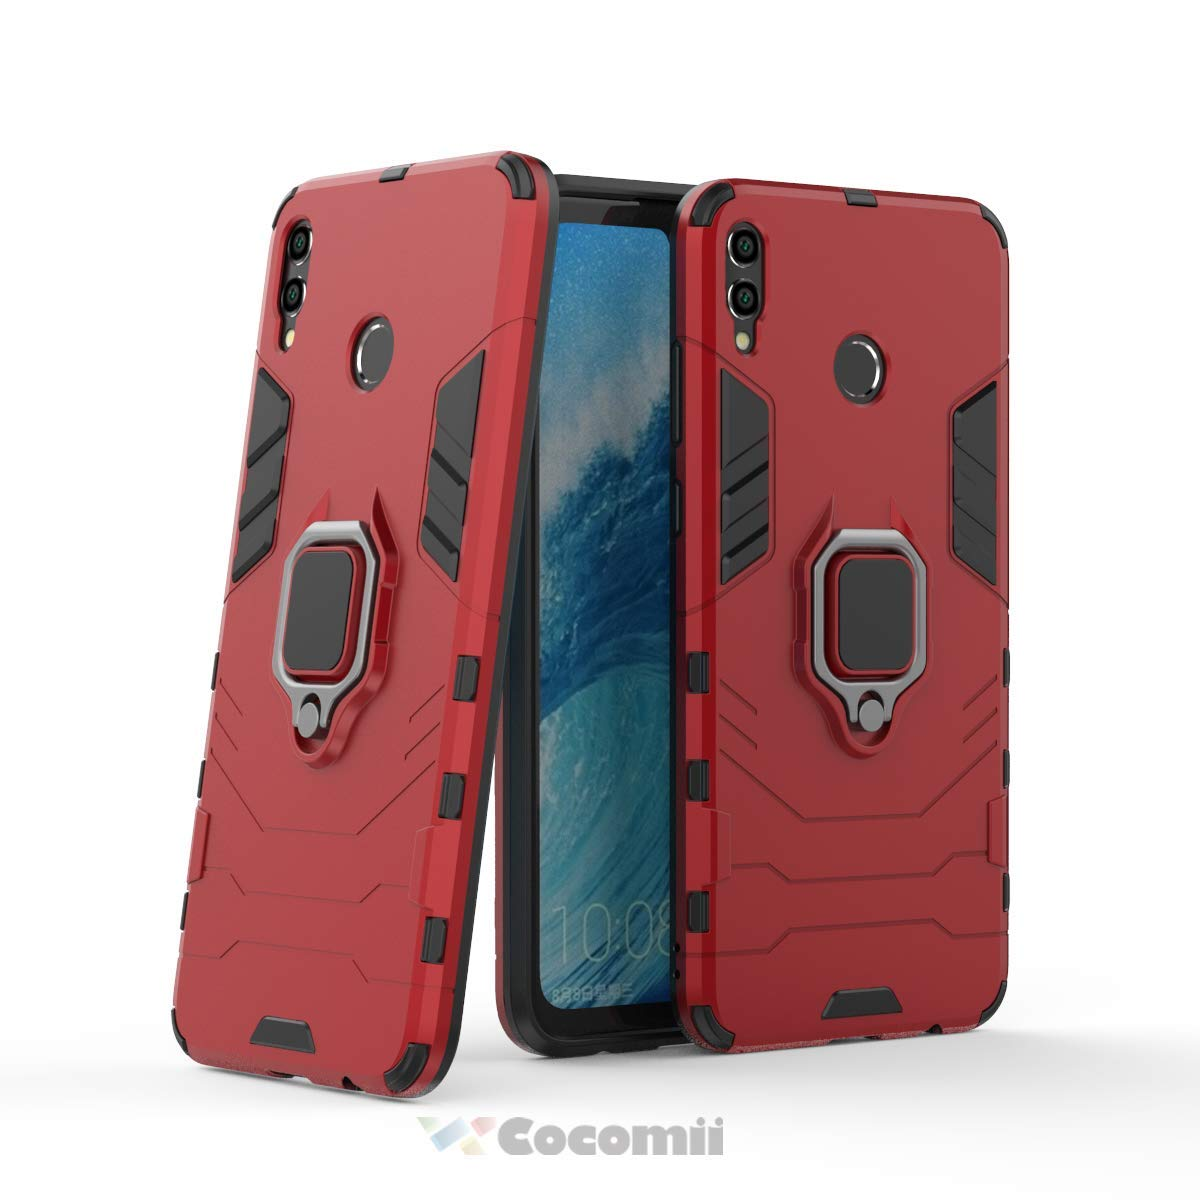 Funda Para Huawei Honor 8x Con Pie Cocomii (7k1849tc)